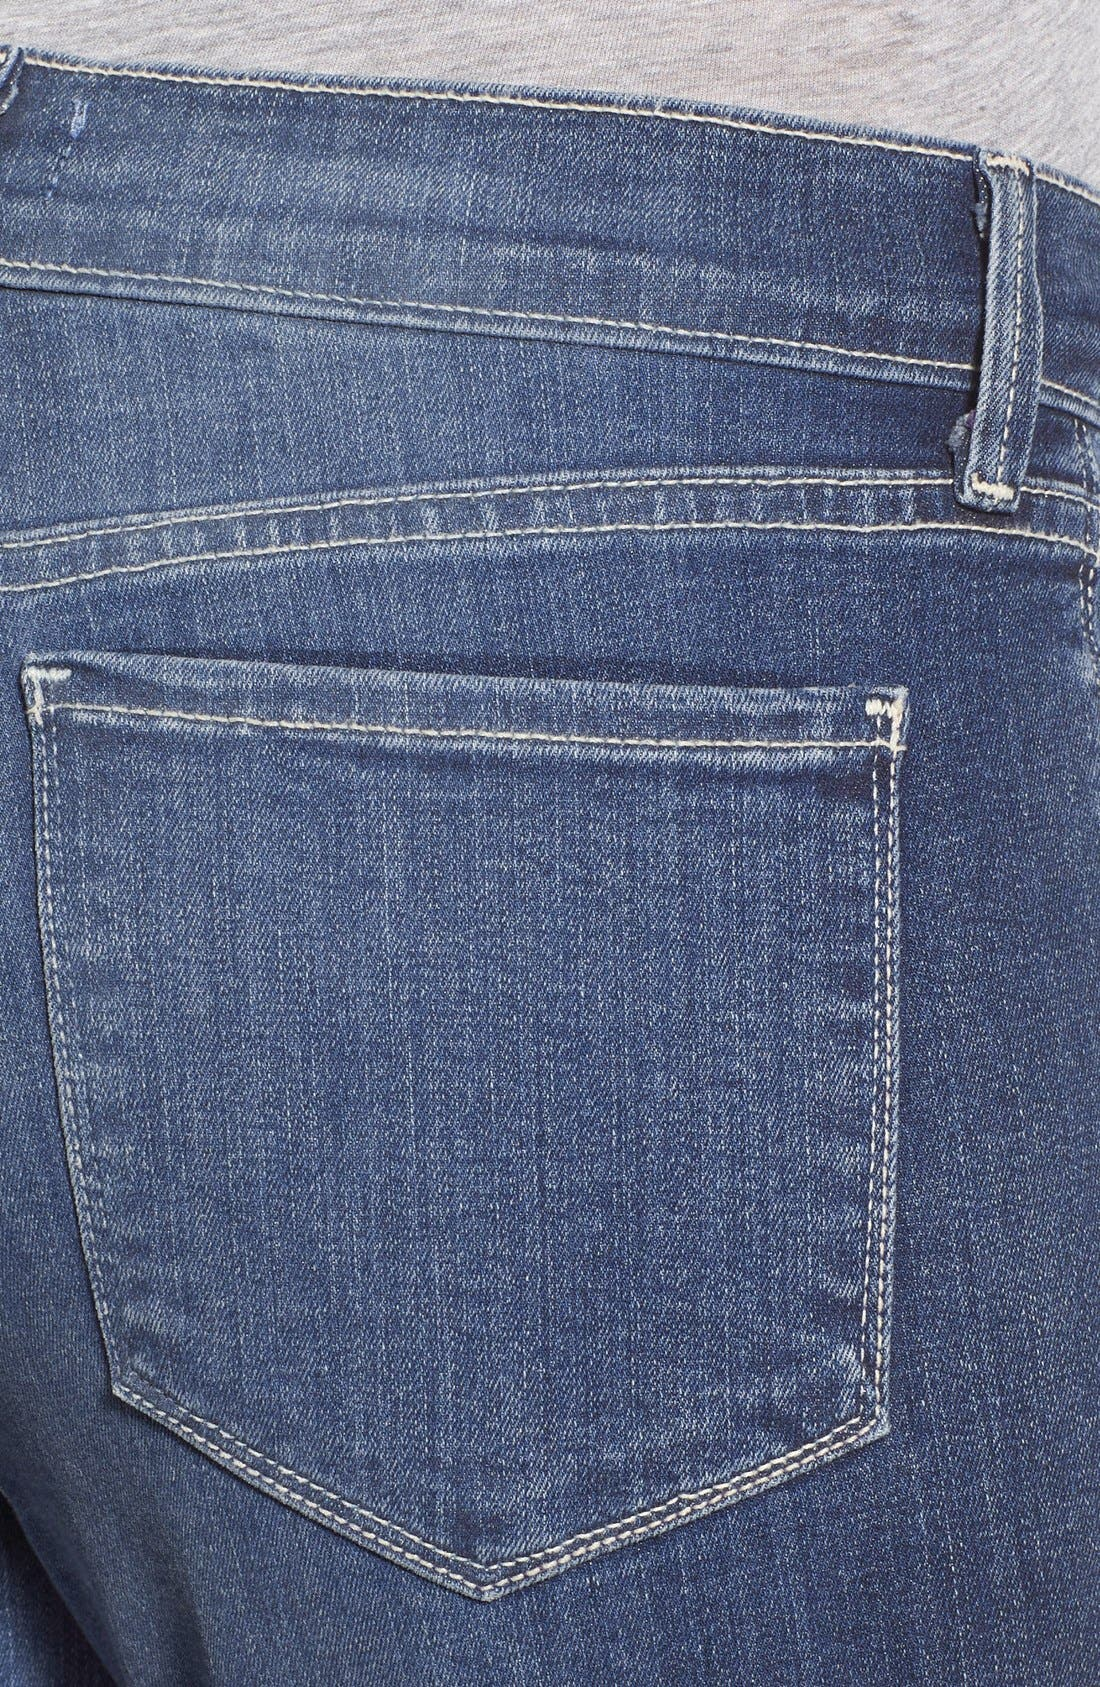 'Dayla' Colored Wide Cuff Capri Jeans,                             Alternate thumbnail 50, color,